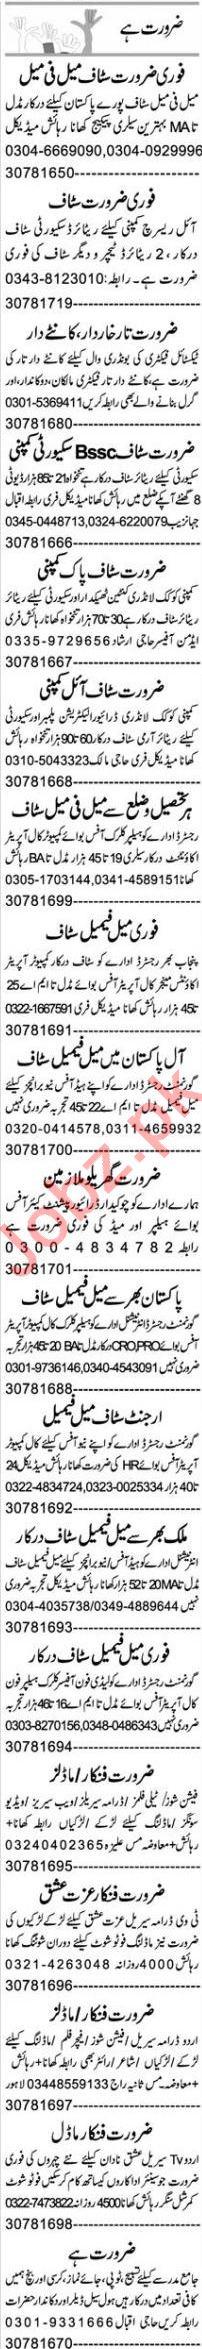 Civil Supervisor & Promotion Officer Jobs 2021 in Lahore